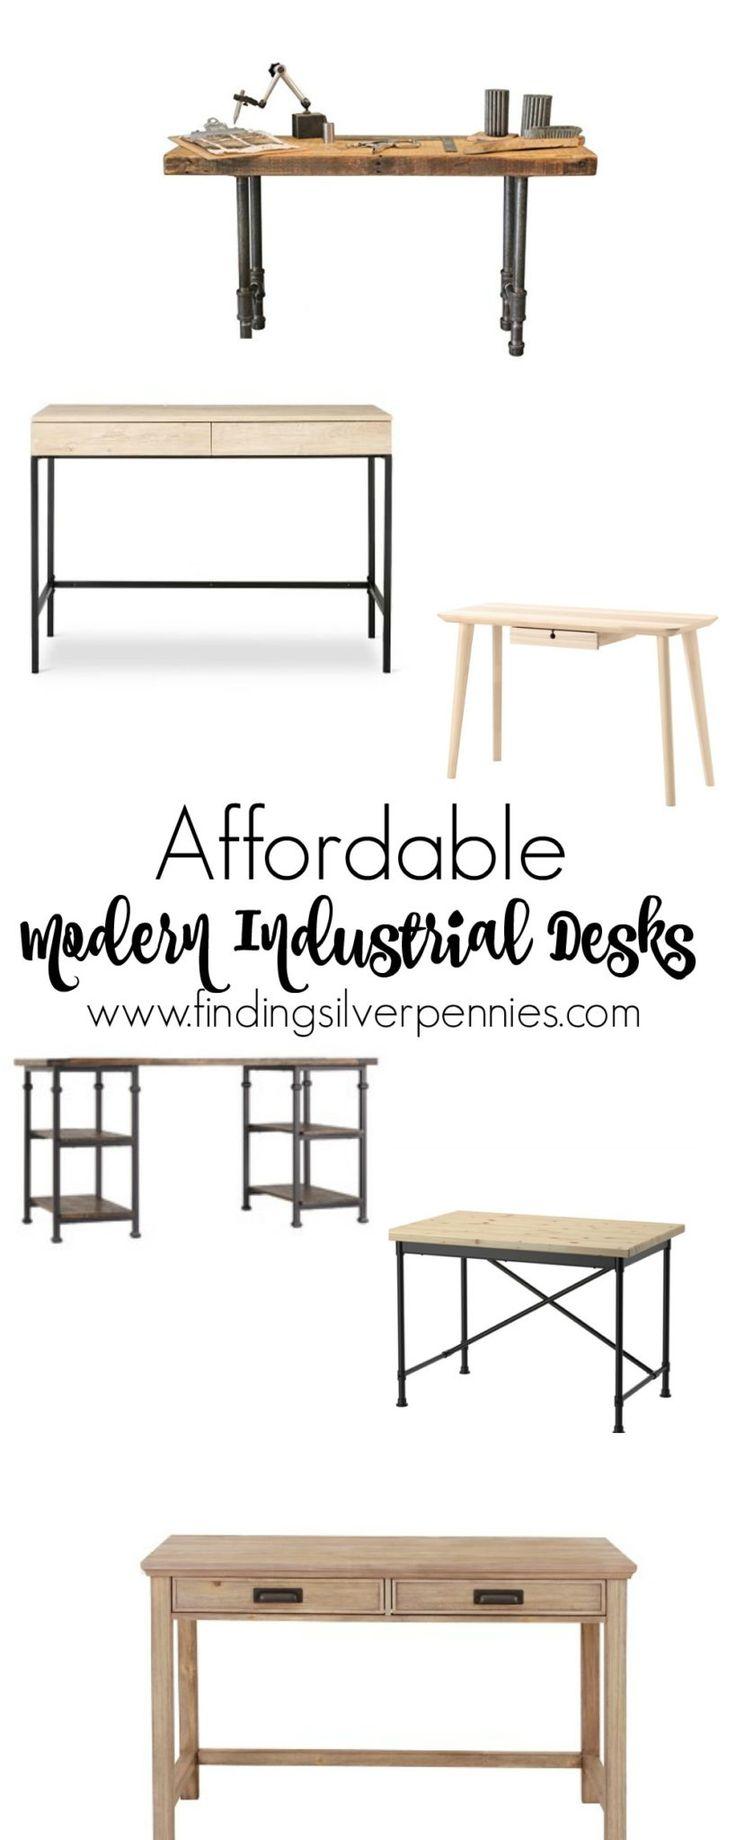 6 Affordable Modern Industrial Desks - Finding Silver Pennies